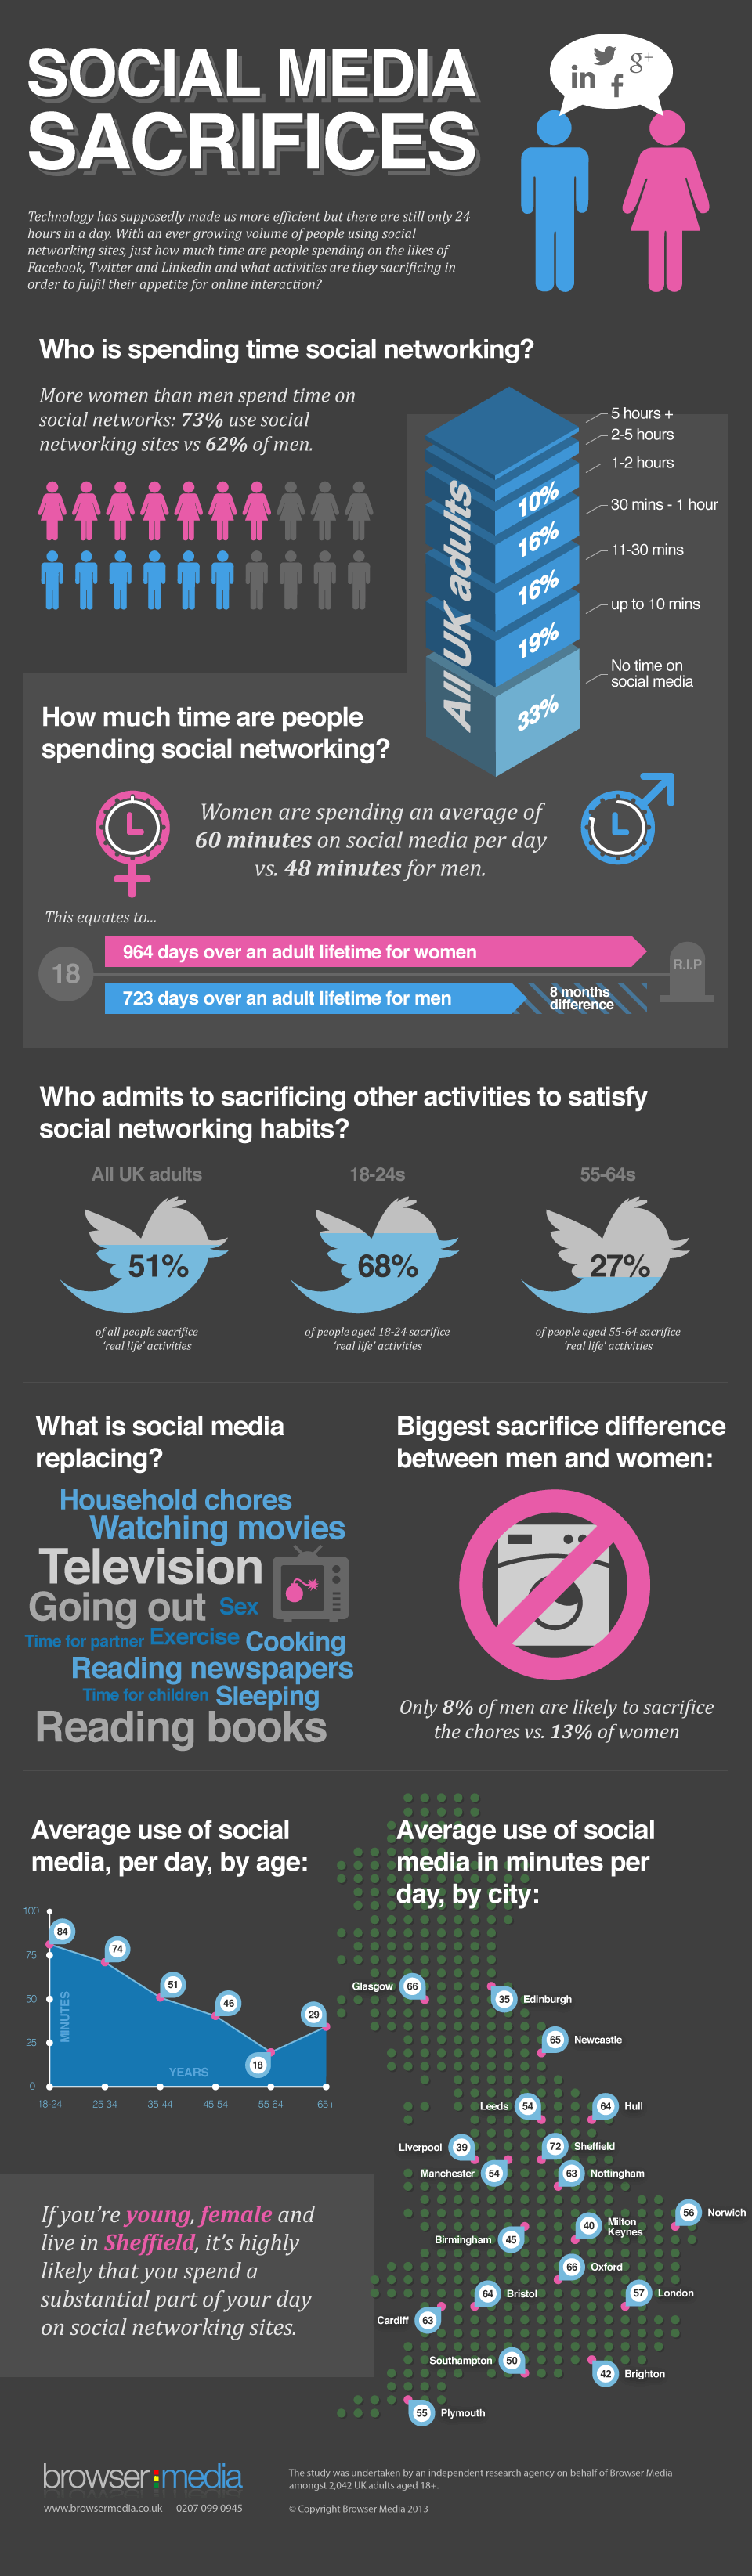 Social media sacrifices infographic